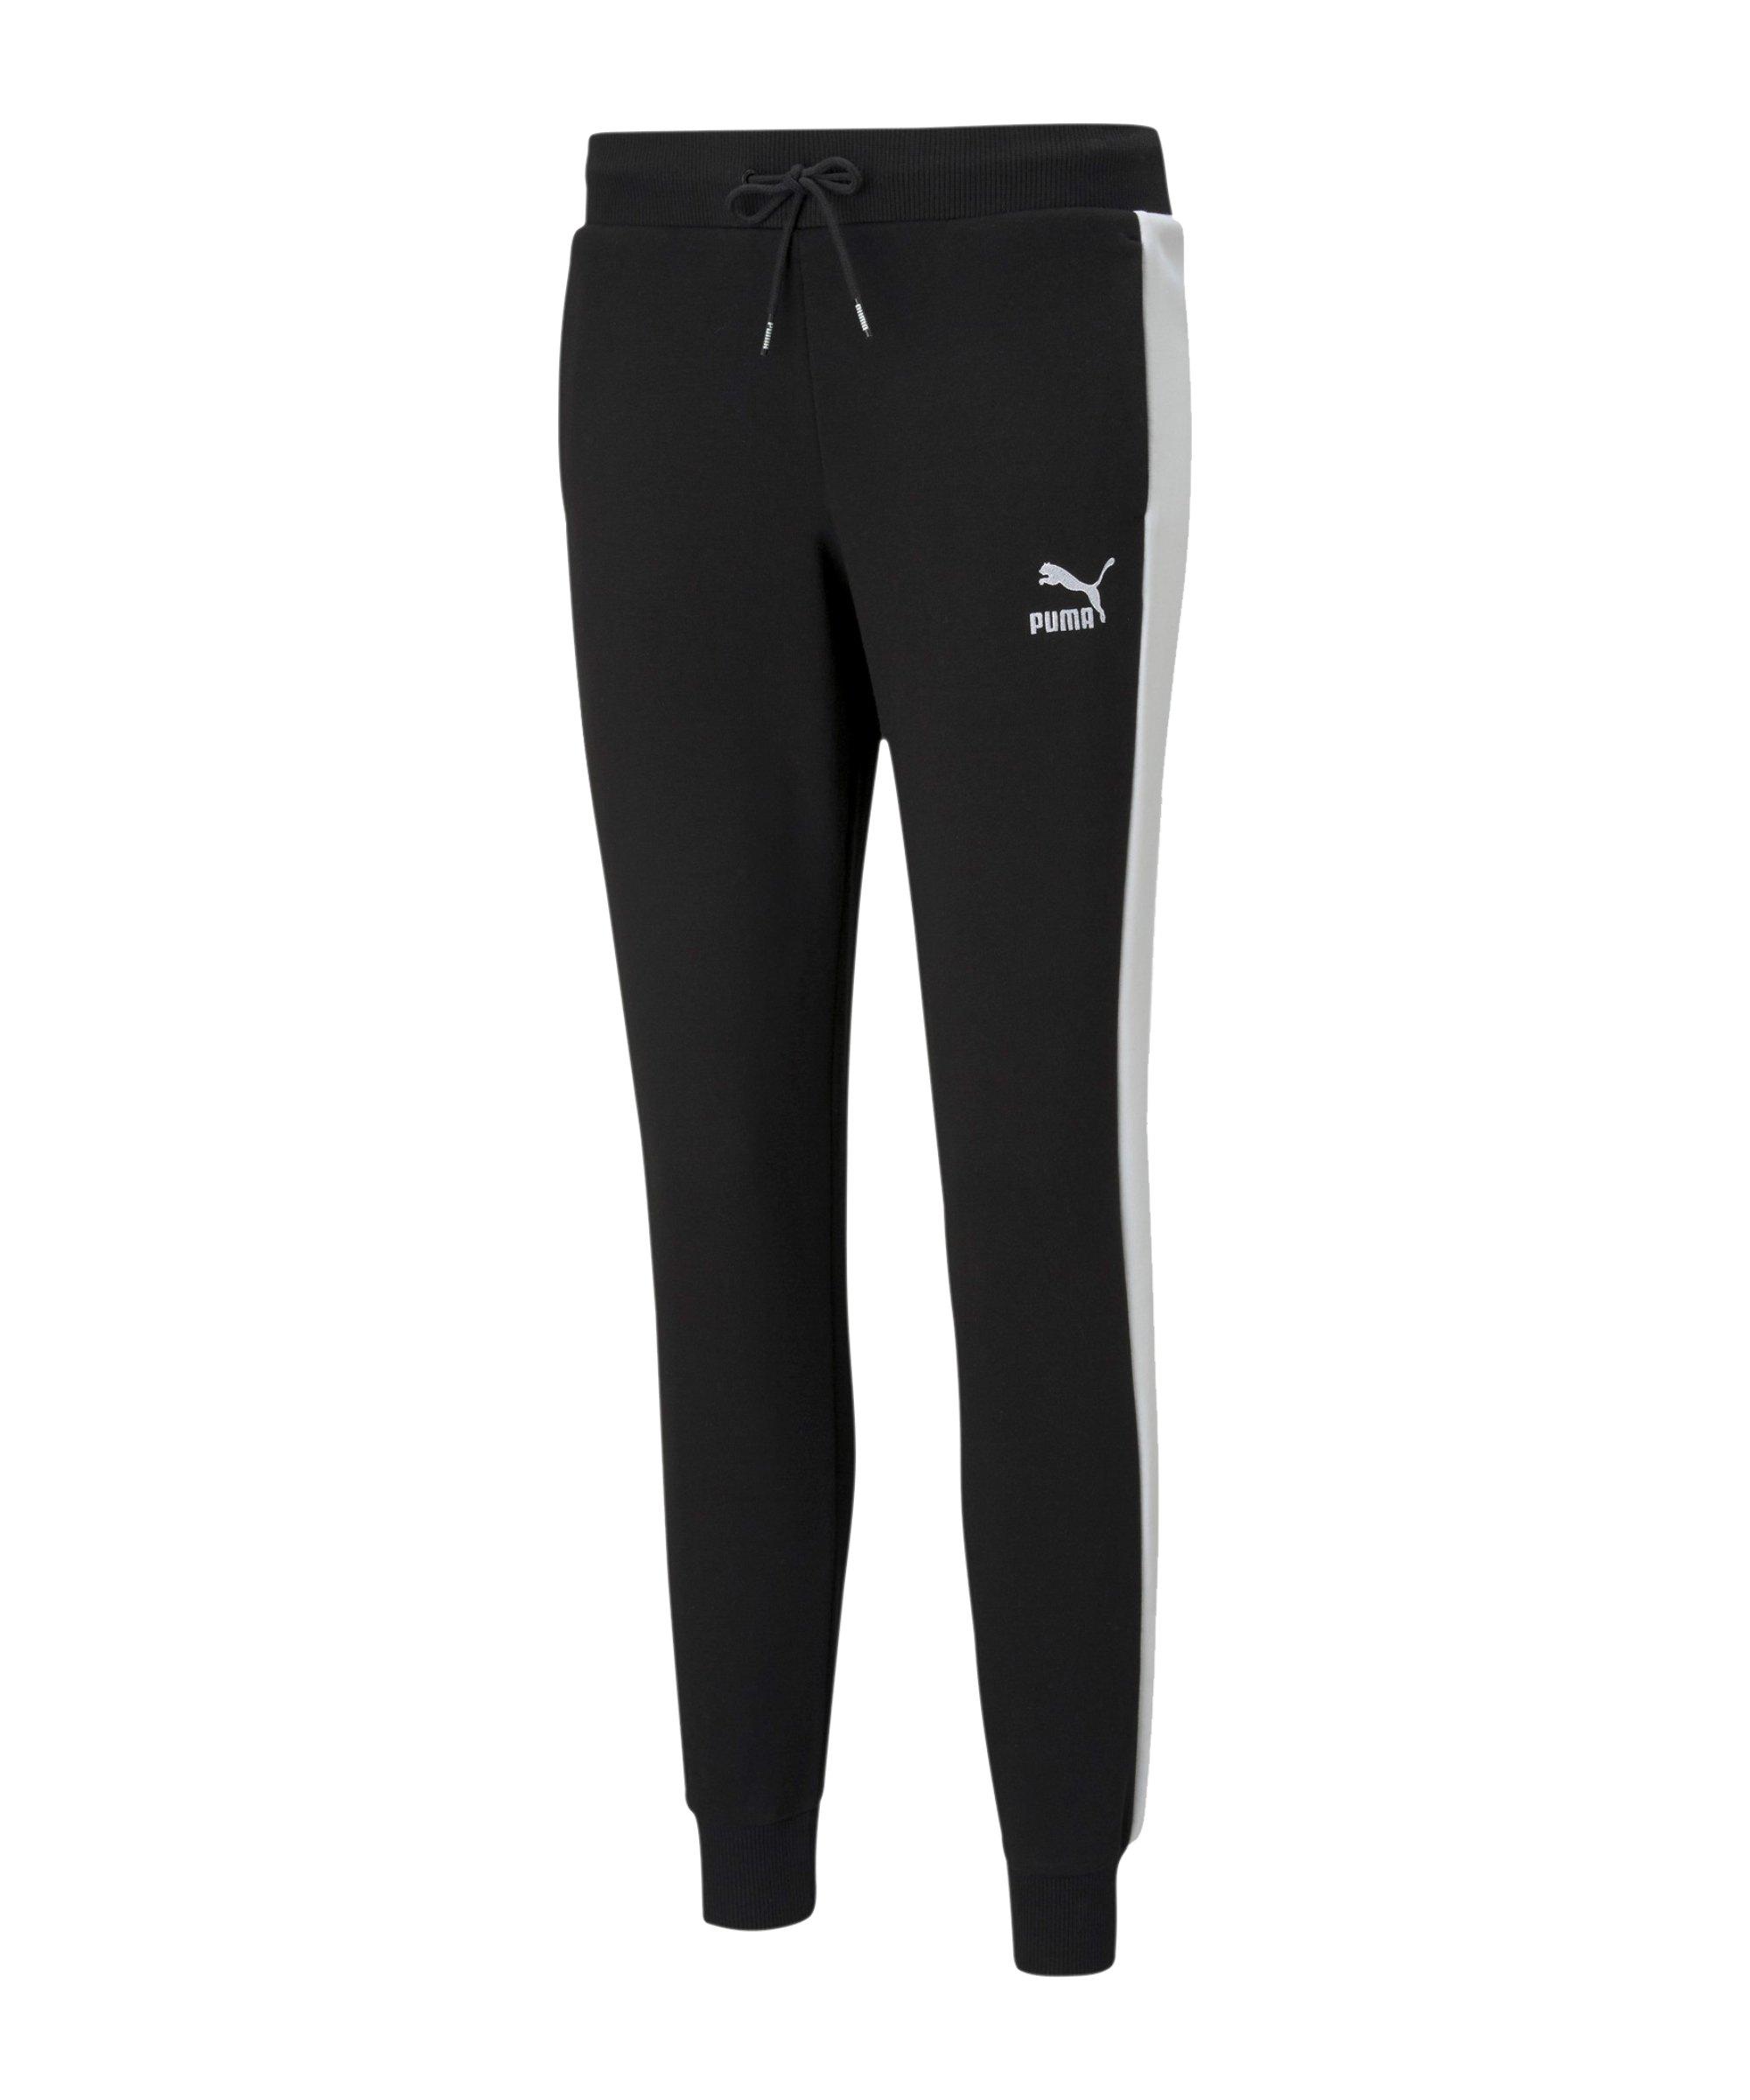 PUMA Iconic T7 Joggingshose Damen Schwarz F01 - schwarz